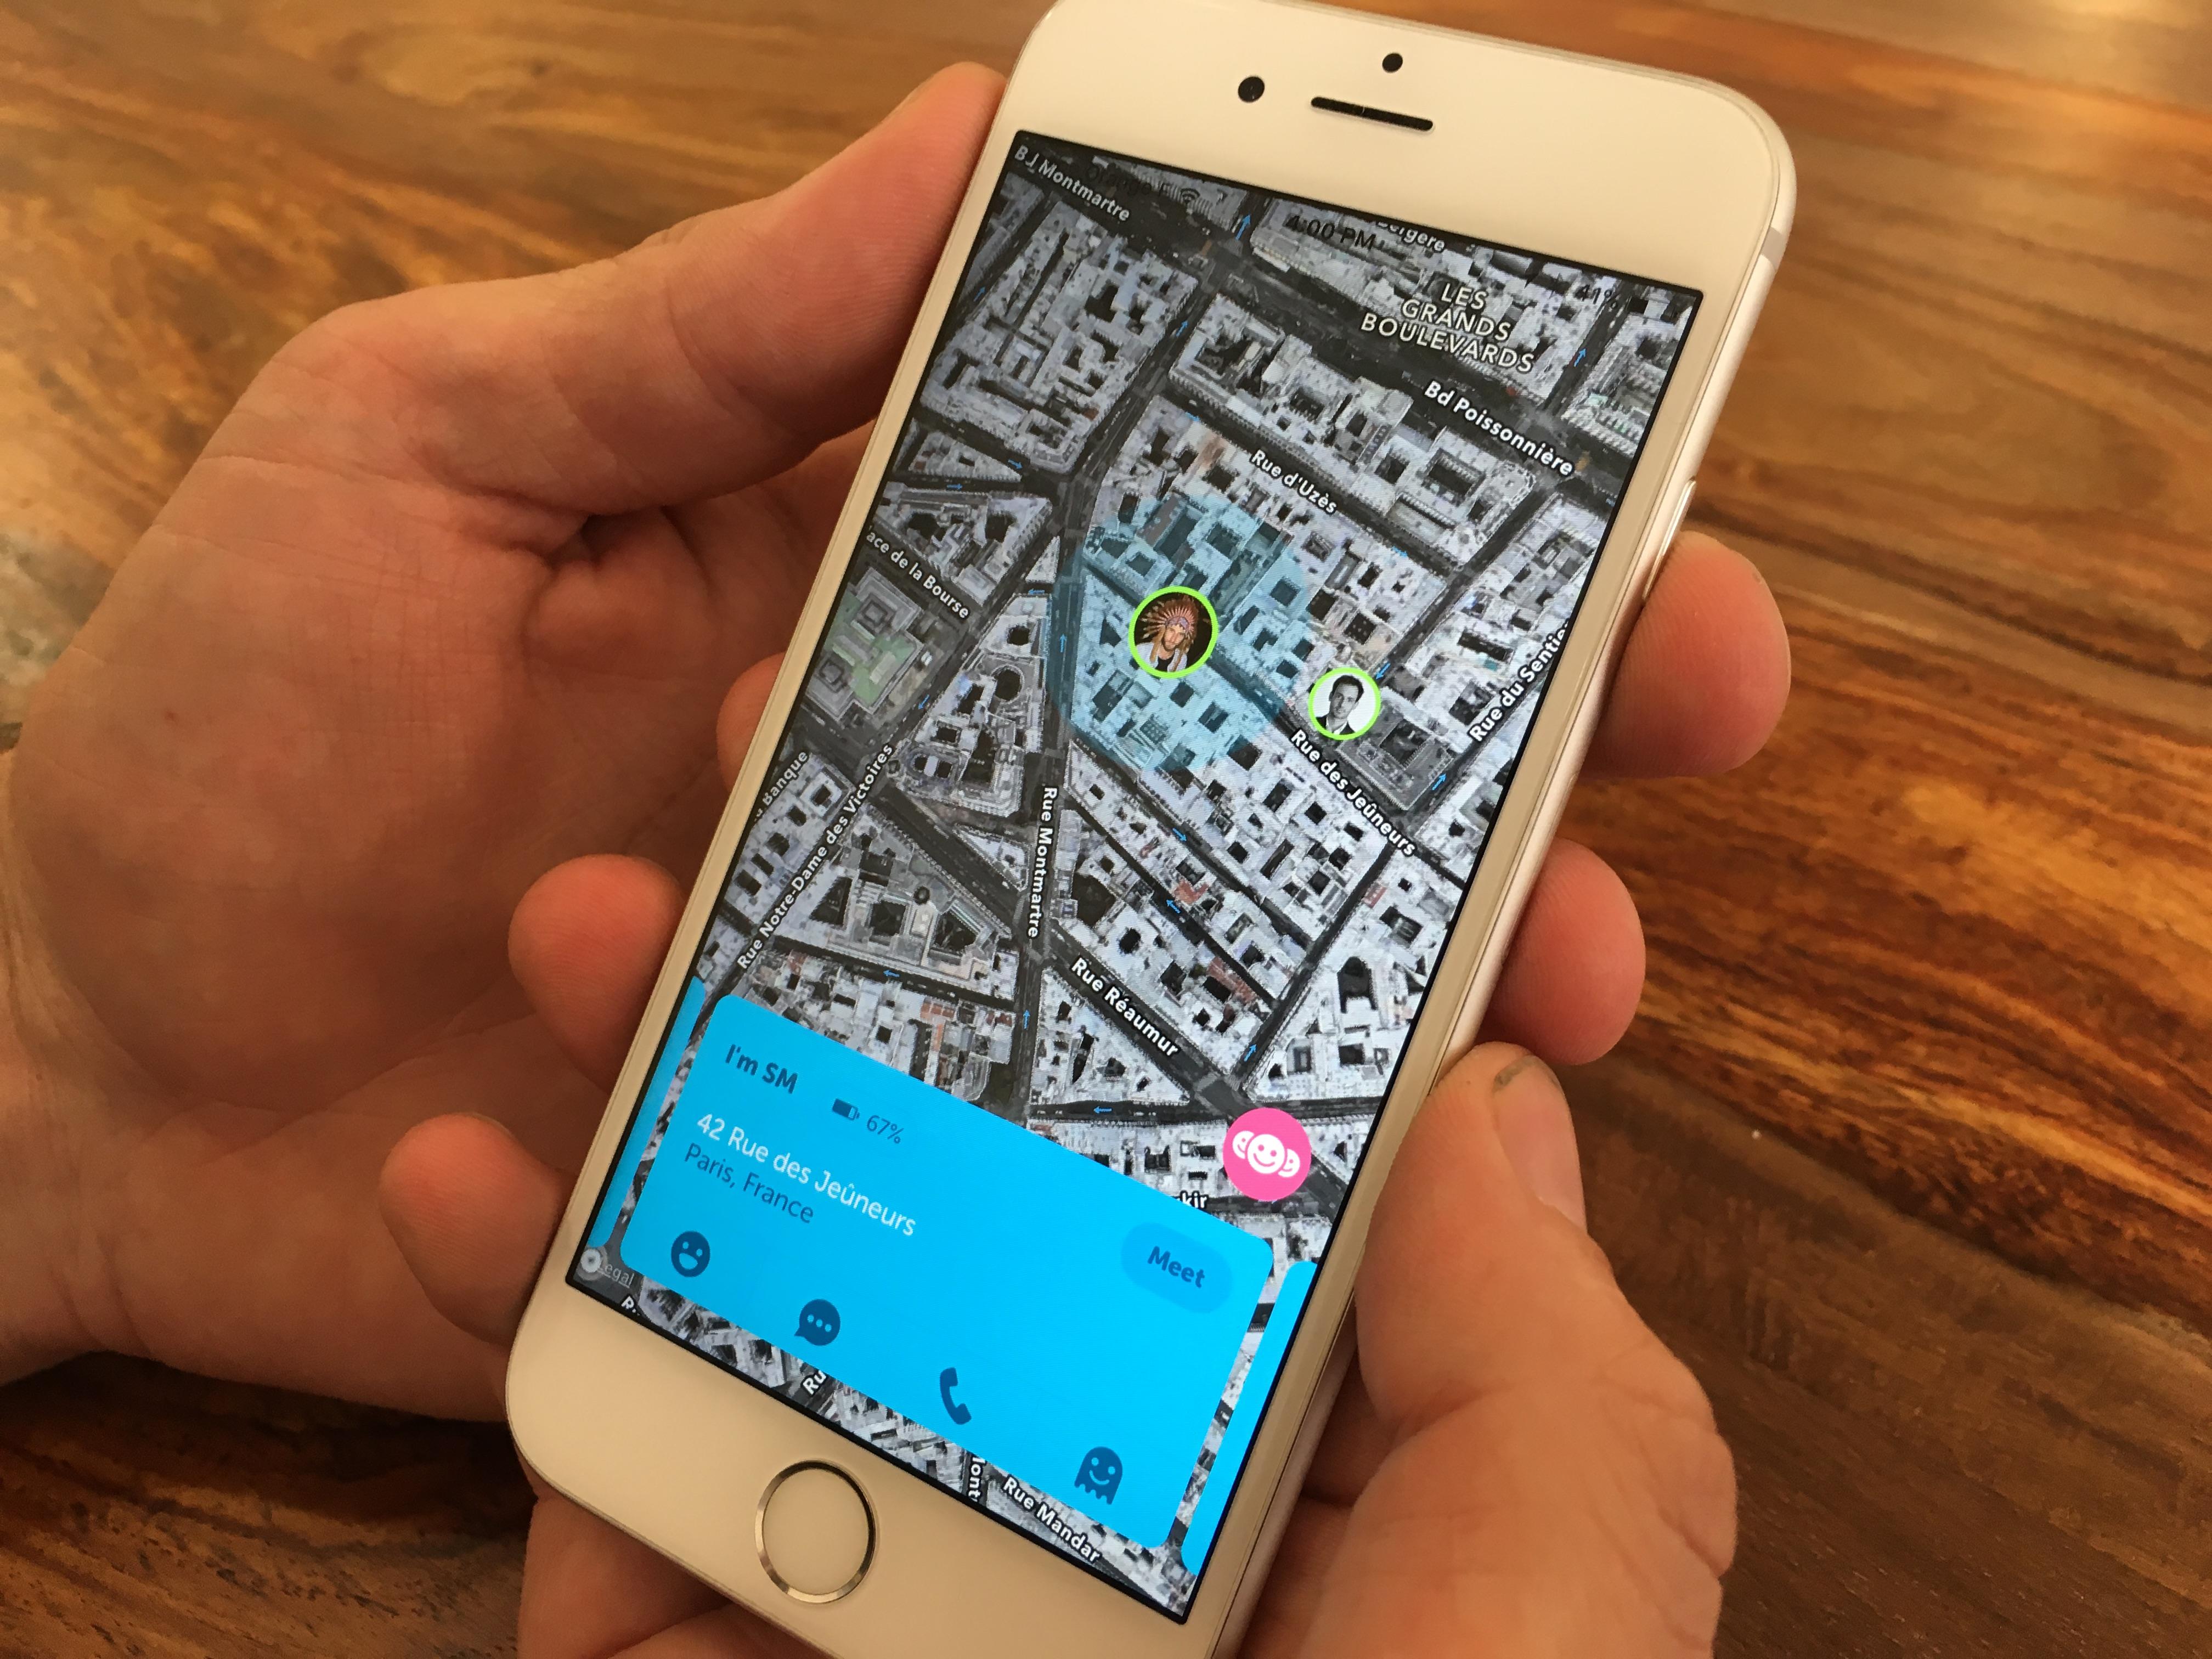 Zenly proves that location sharing isn't dead | TechCrunch